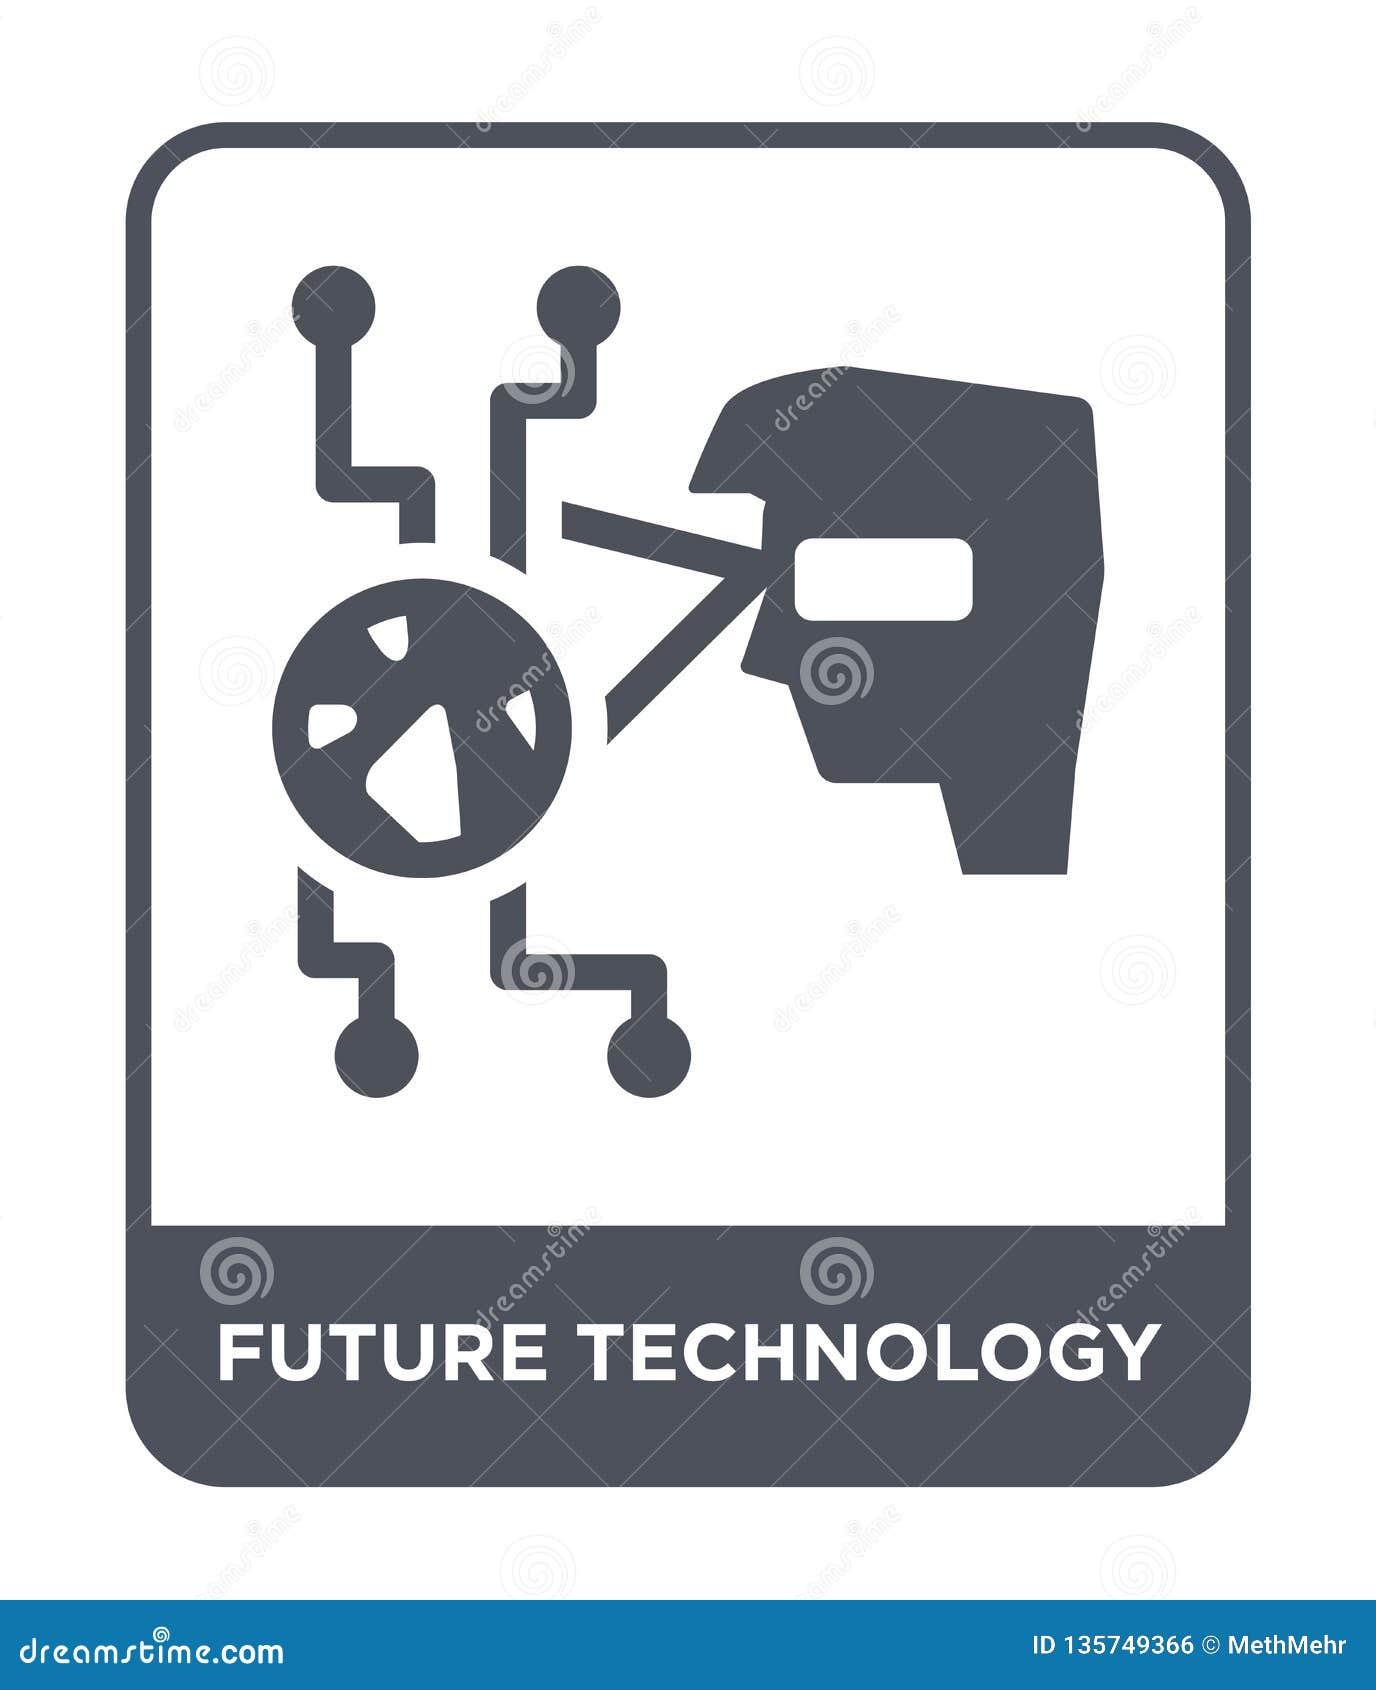 Icono futuro de la tecnología en estilo de moda del diseño icono futuro de la tecnología aislado en el fondo blanco icono futuro